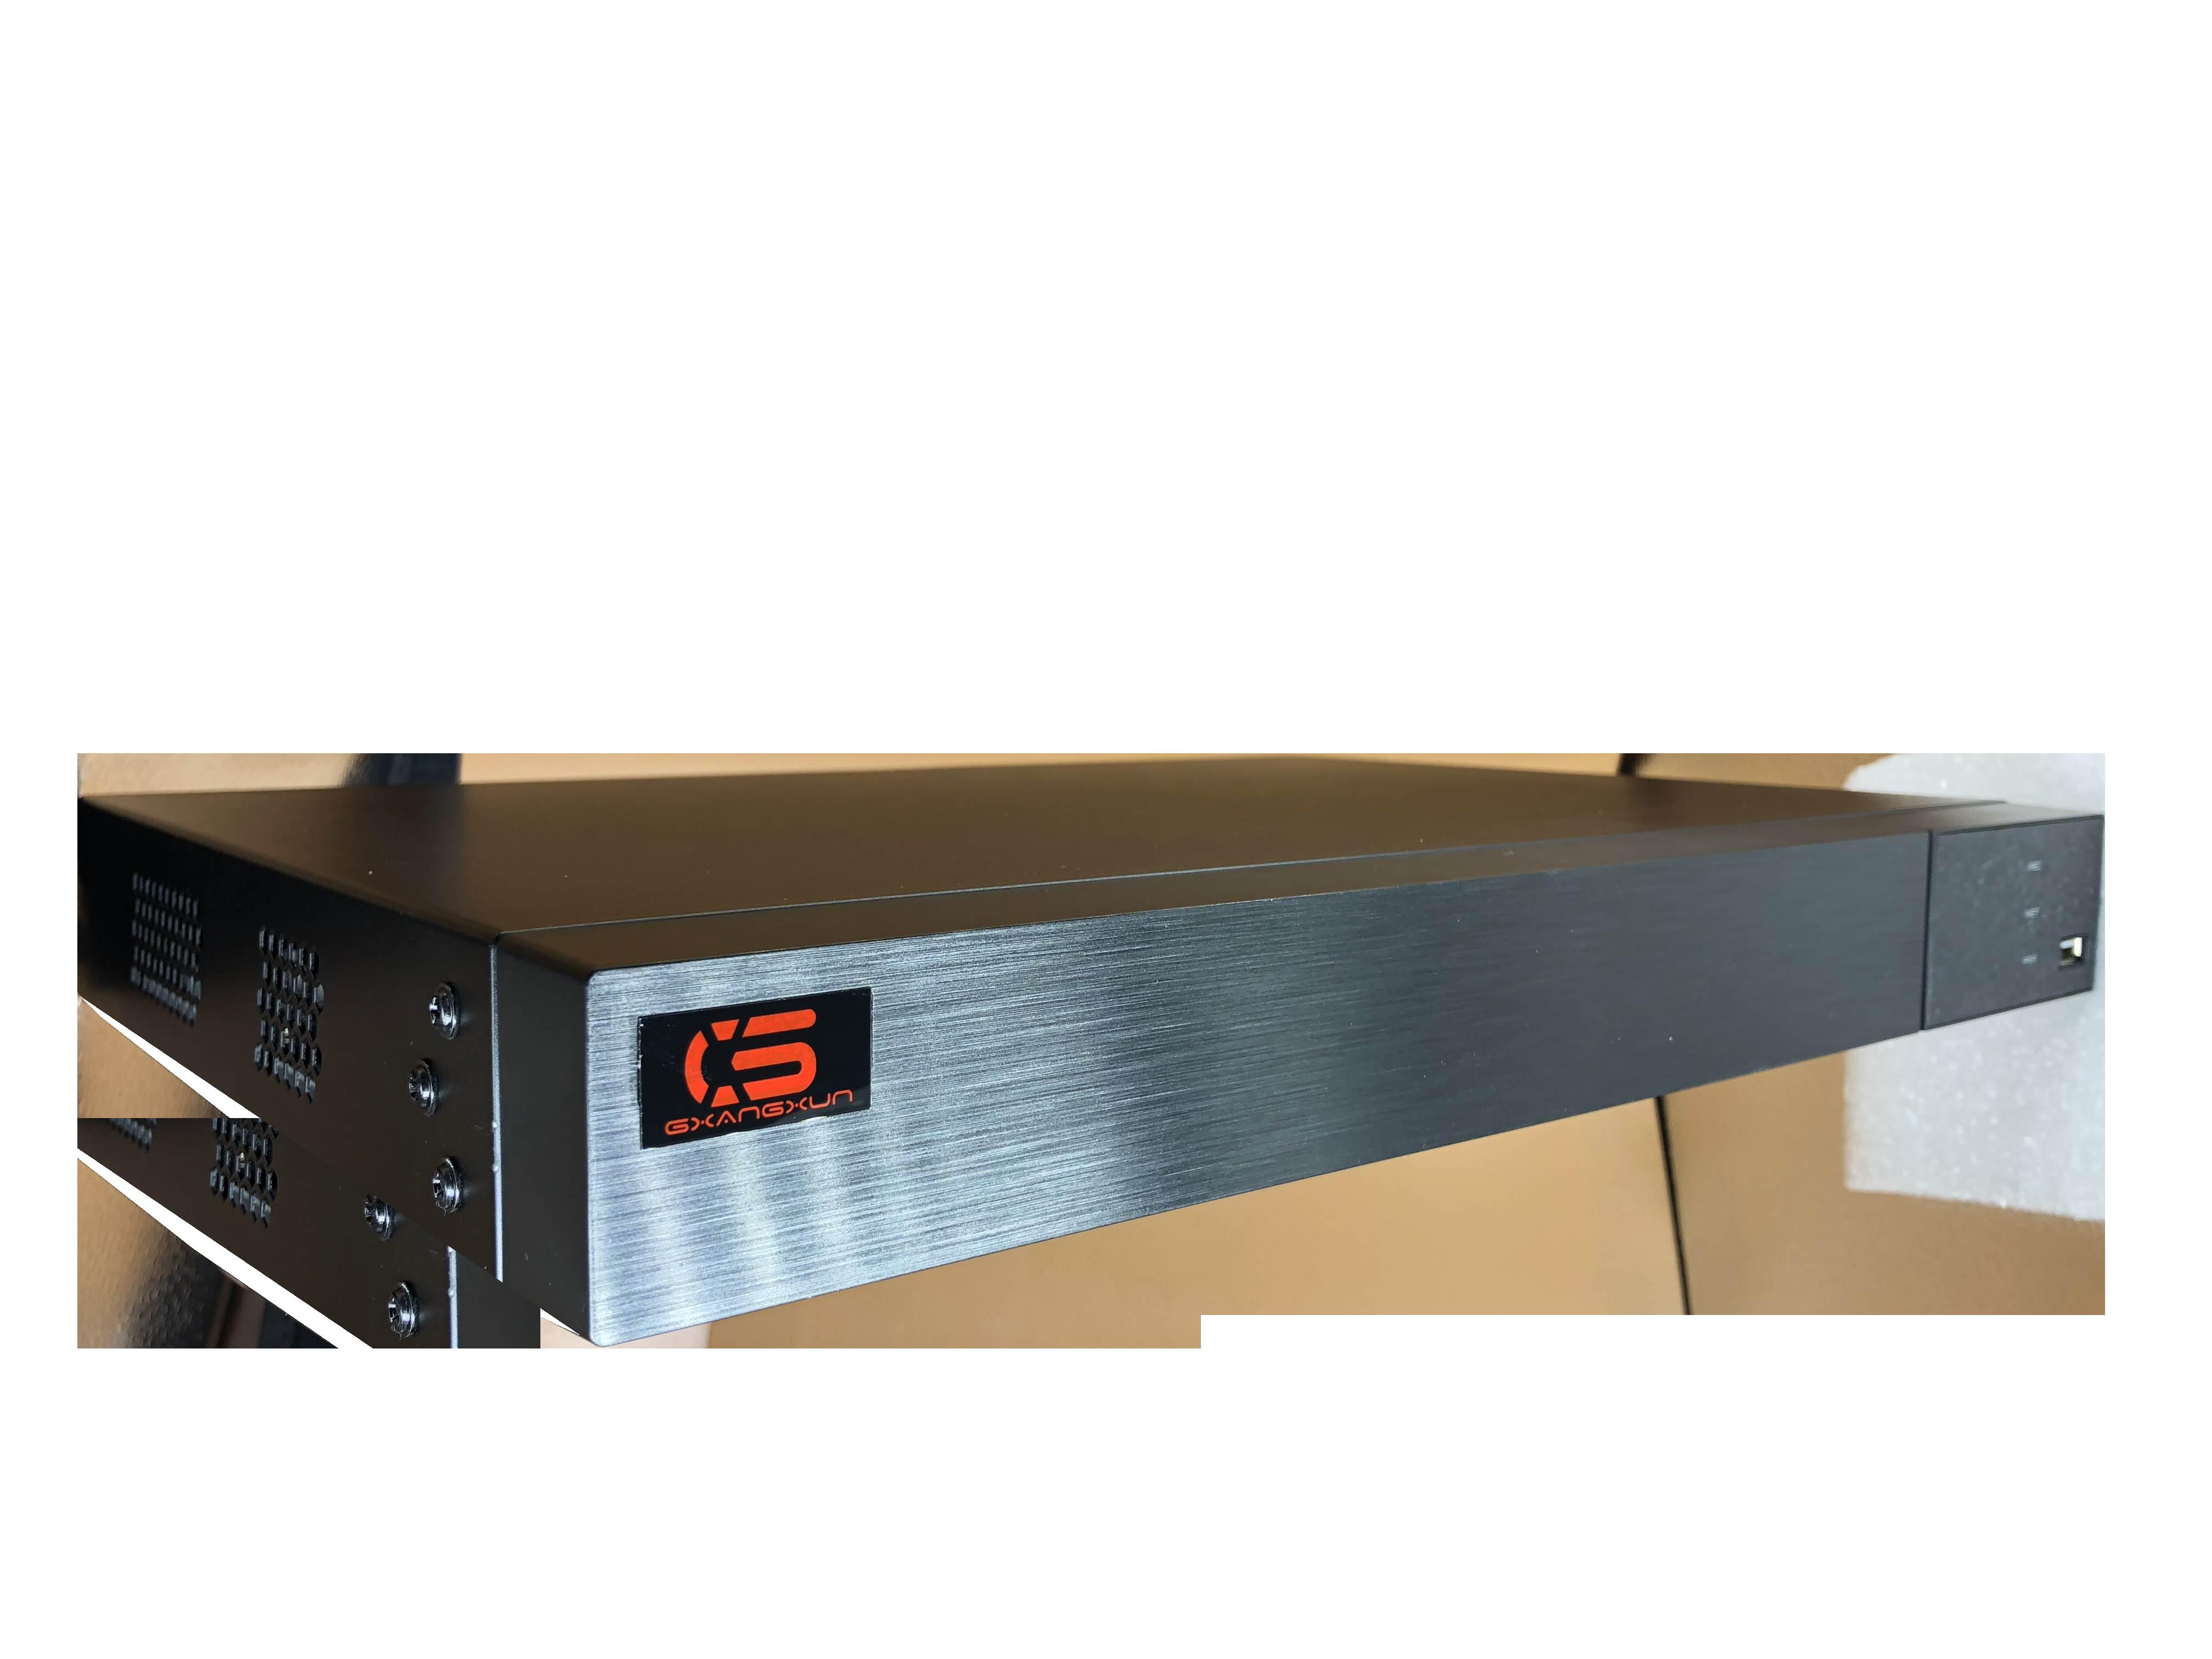 H.264五百萬混合型 16路 DVR